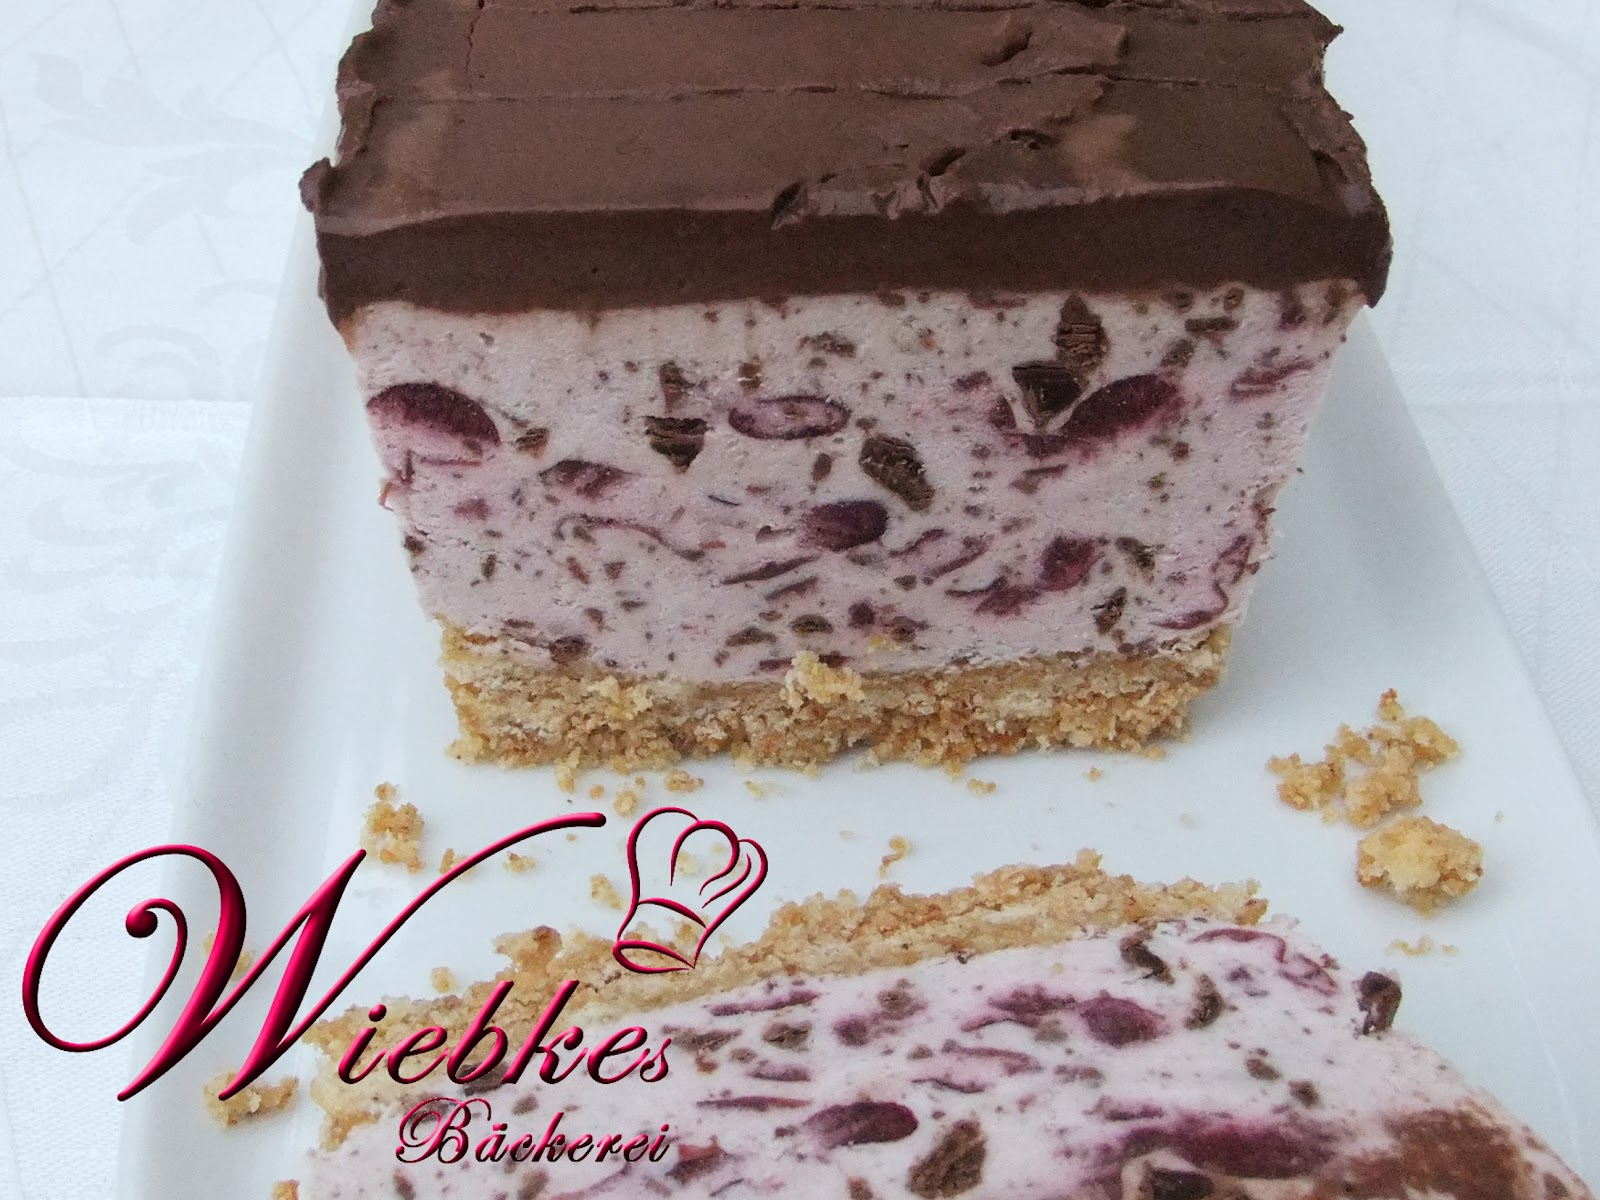 Wiebkes Backerei Stracciatella Kuchen